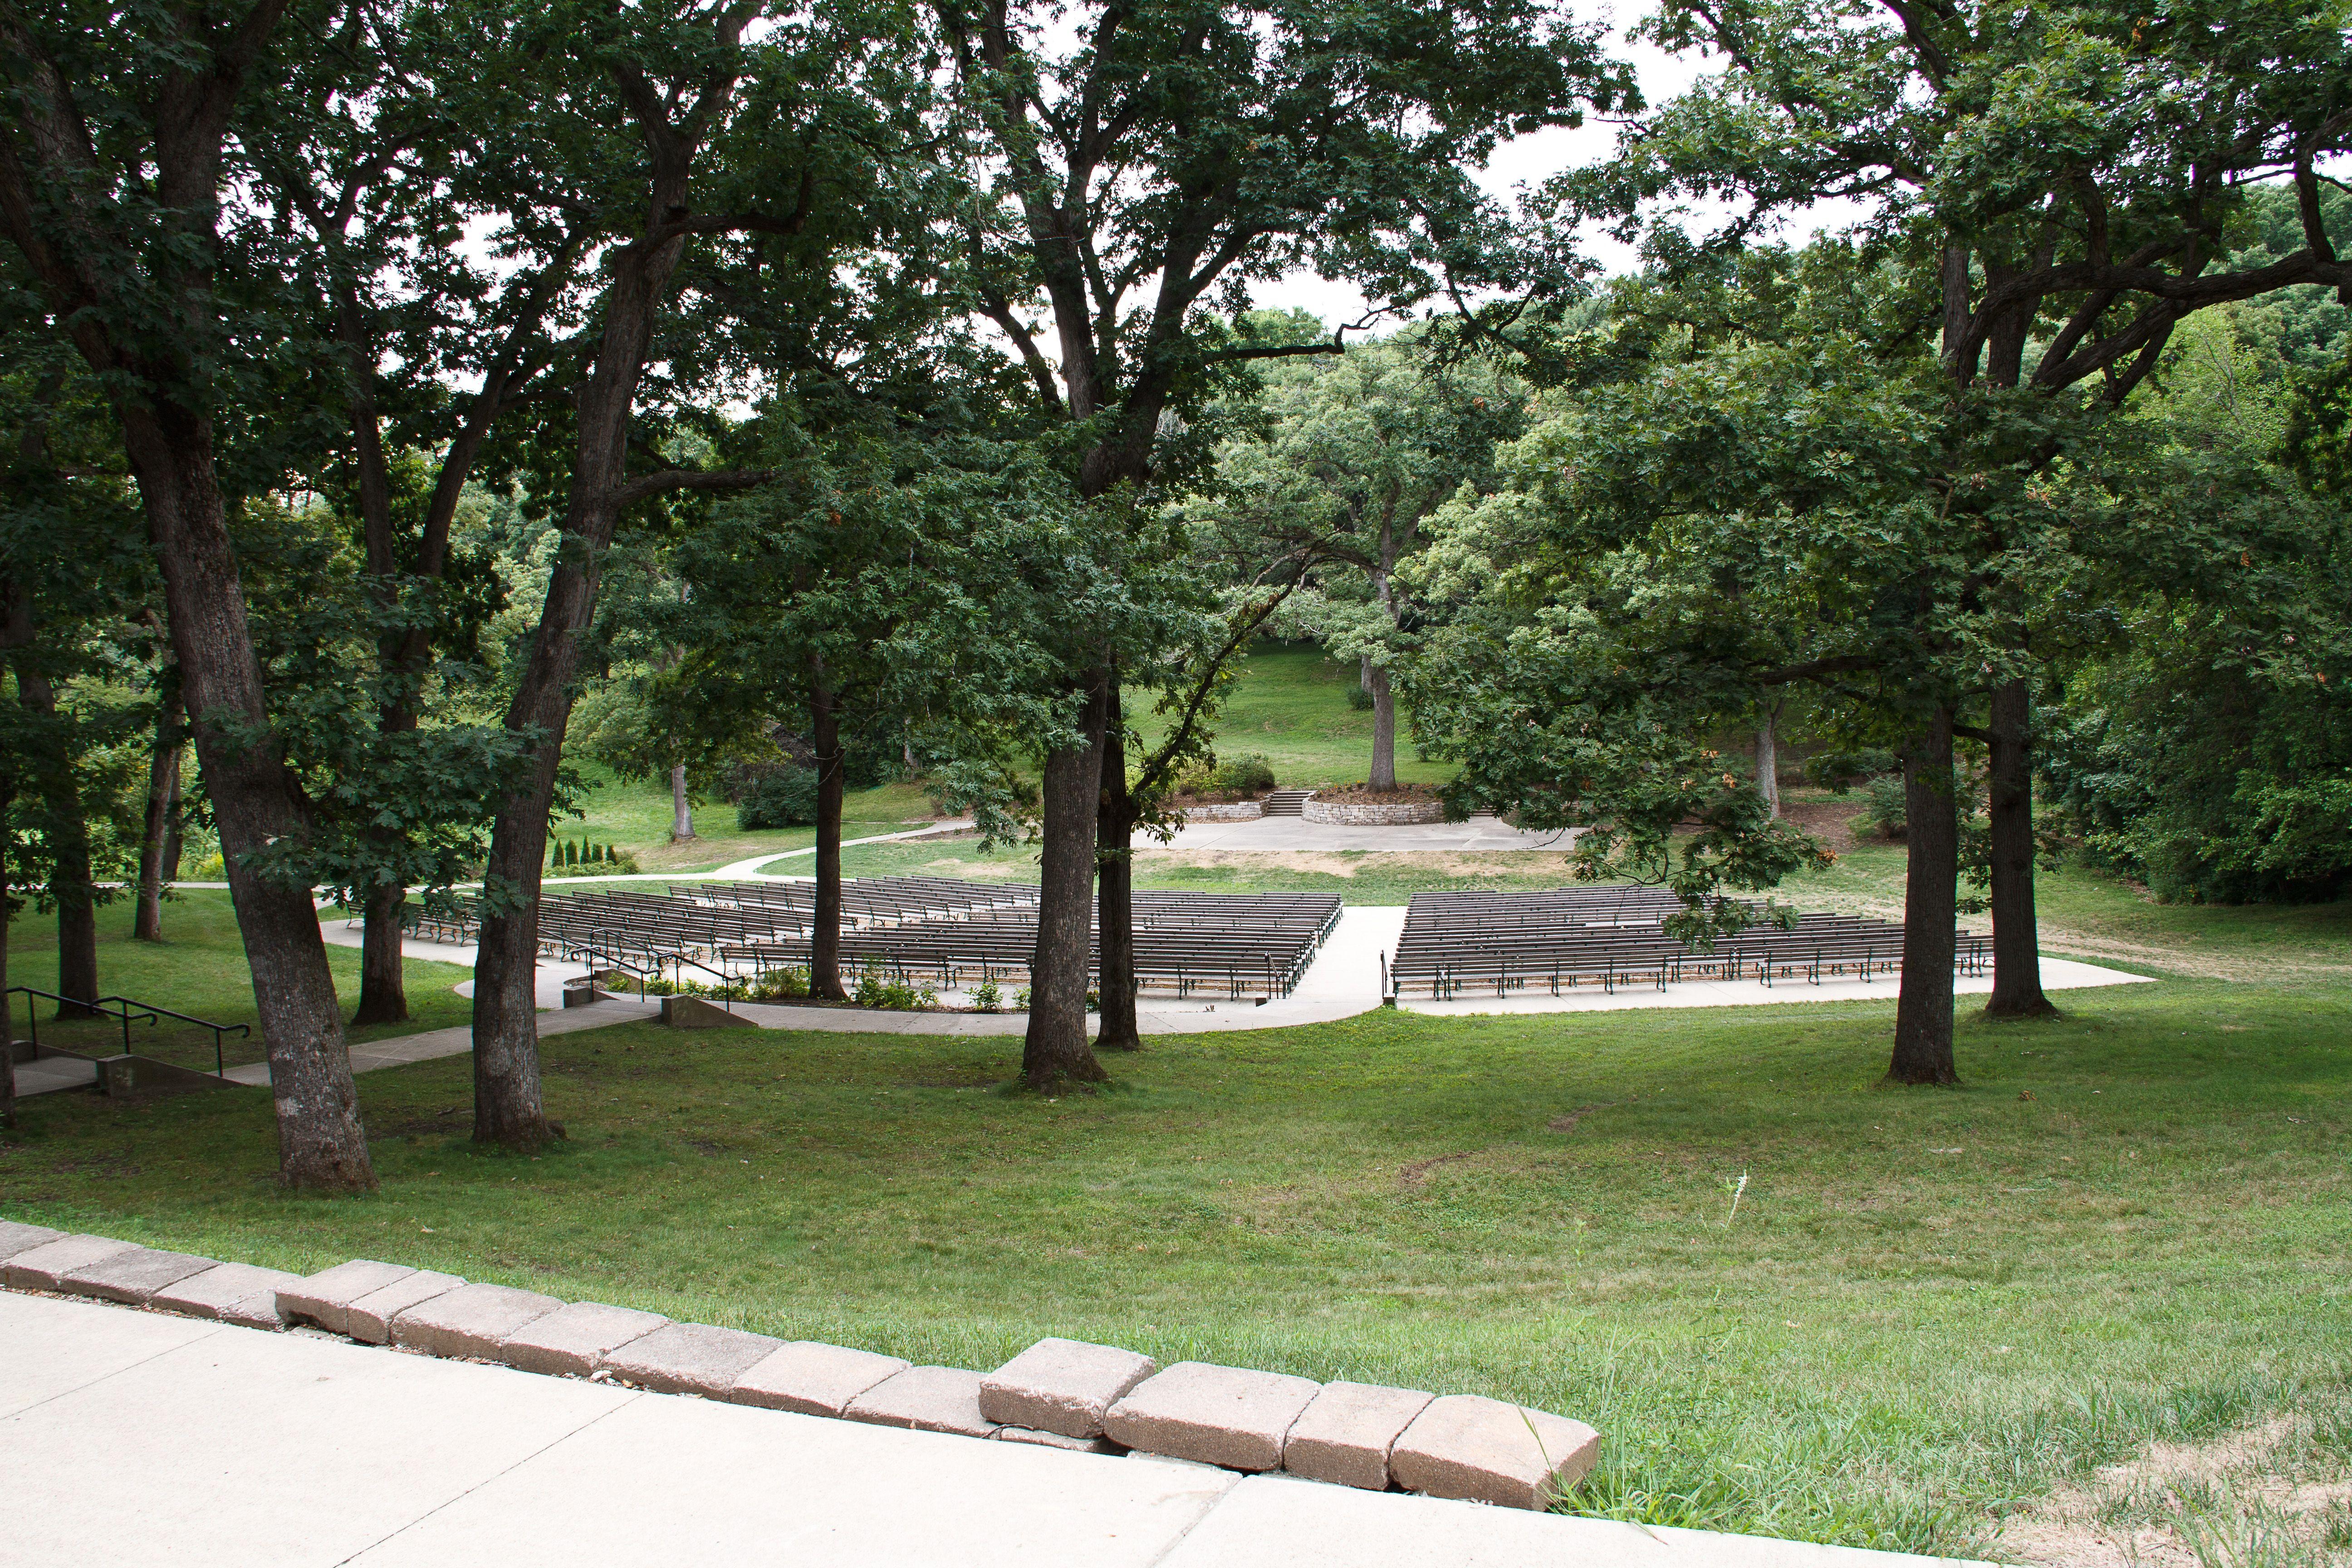 0a748451390d95796c51161c75db9b2d - Better Homes And Gardens Test Garden Des Moines Iowa